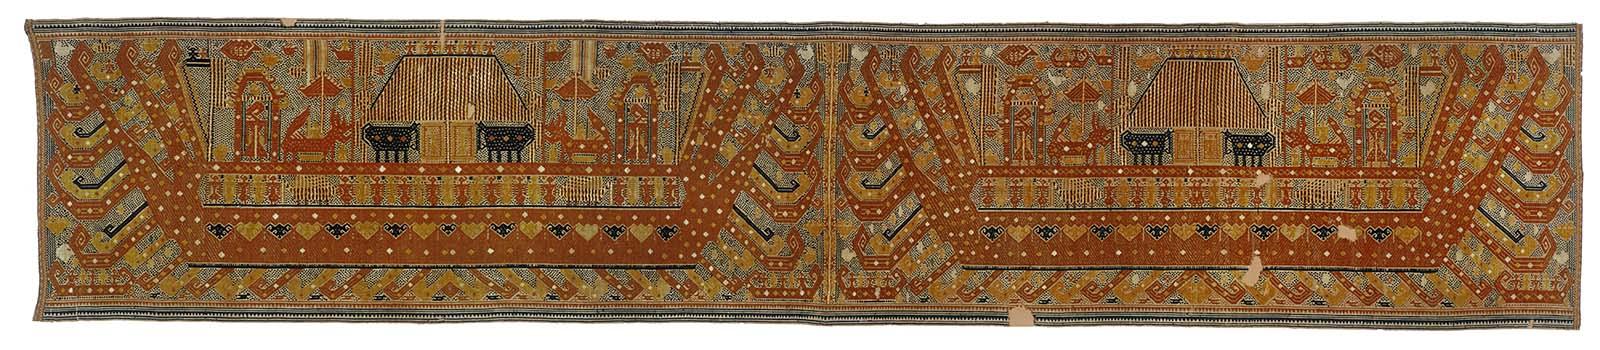 Ceremonial Banner Cloth |  Palepai  © Museum of Fine Arts, Boston | Massachusetts, USA